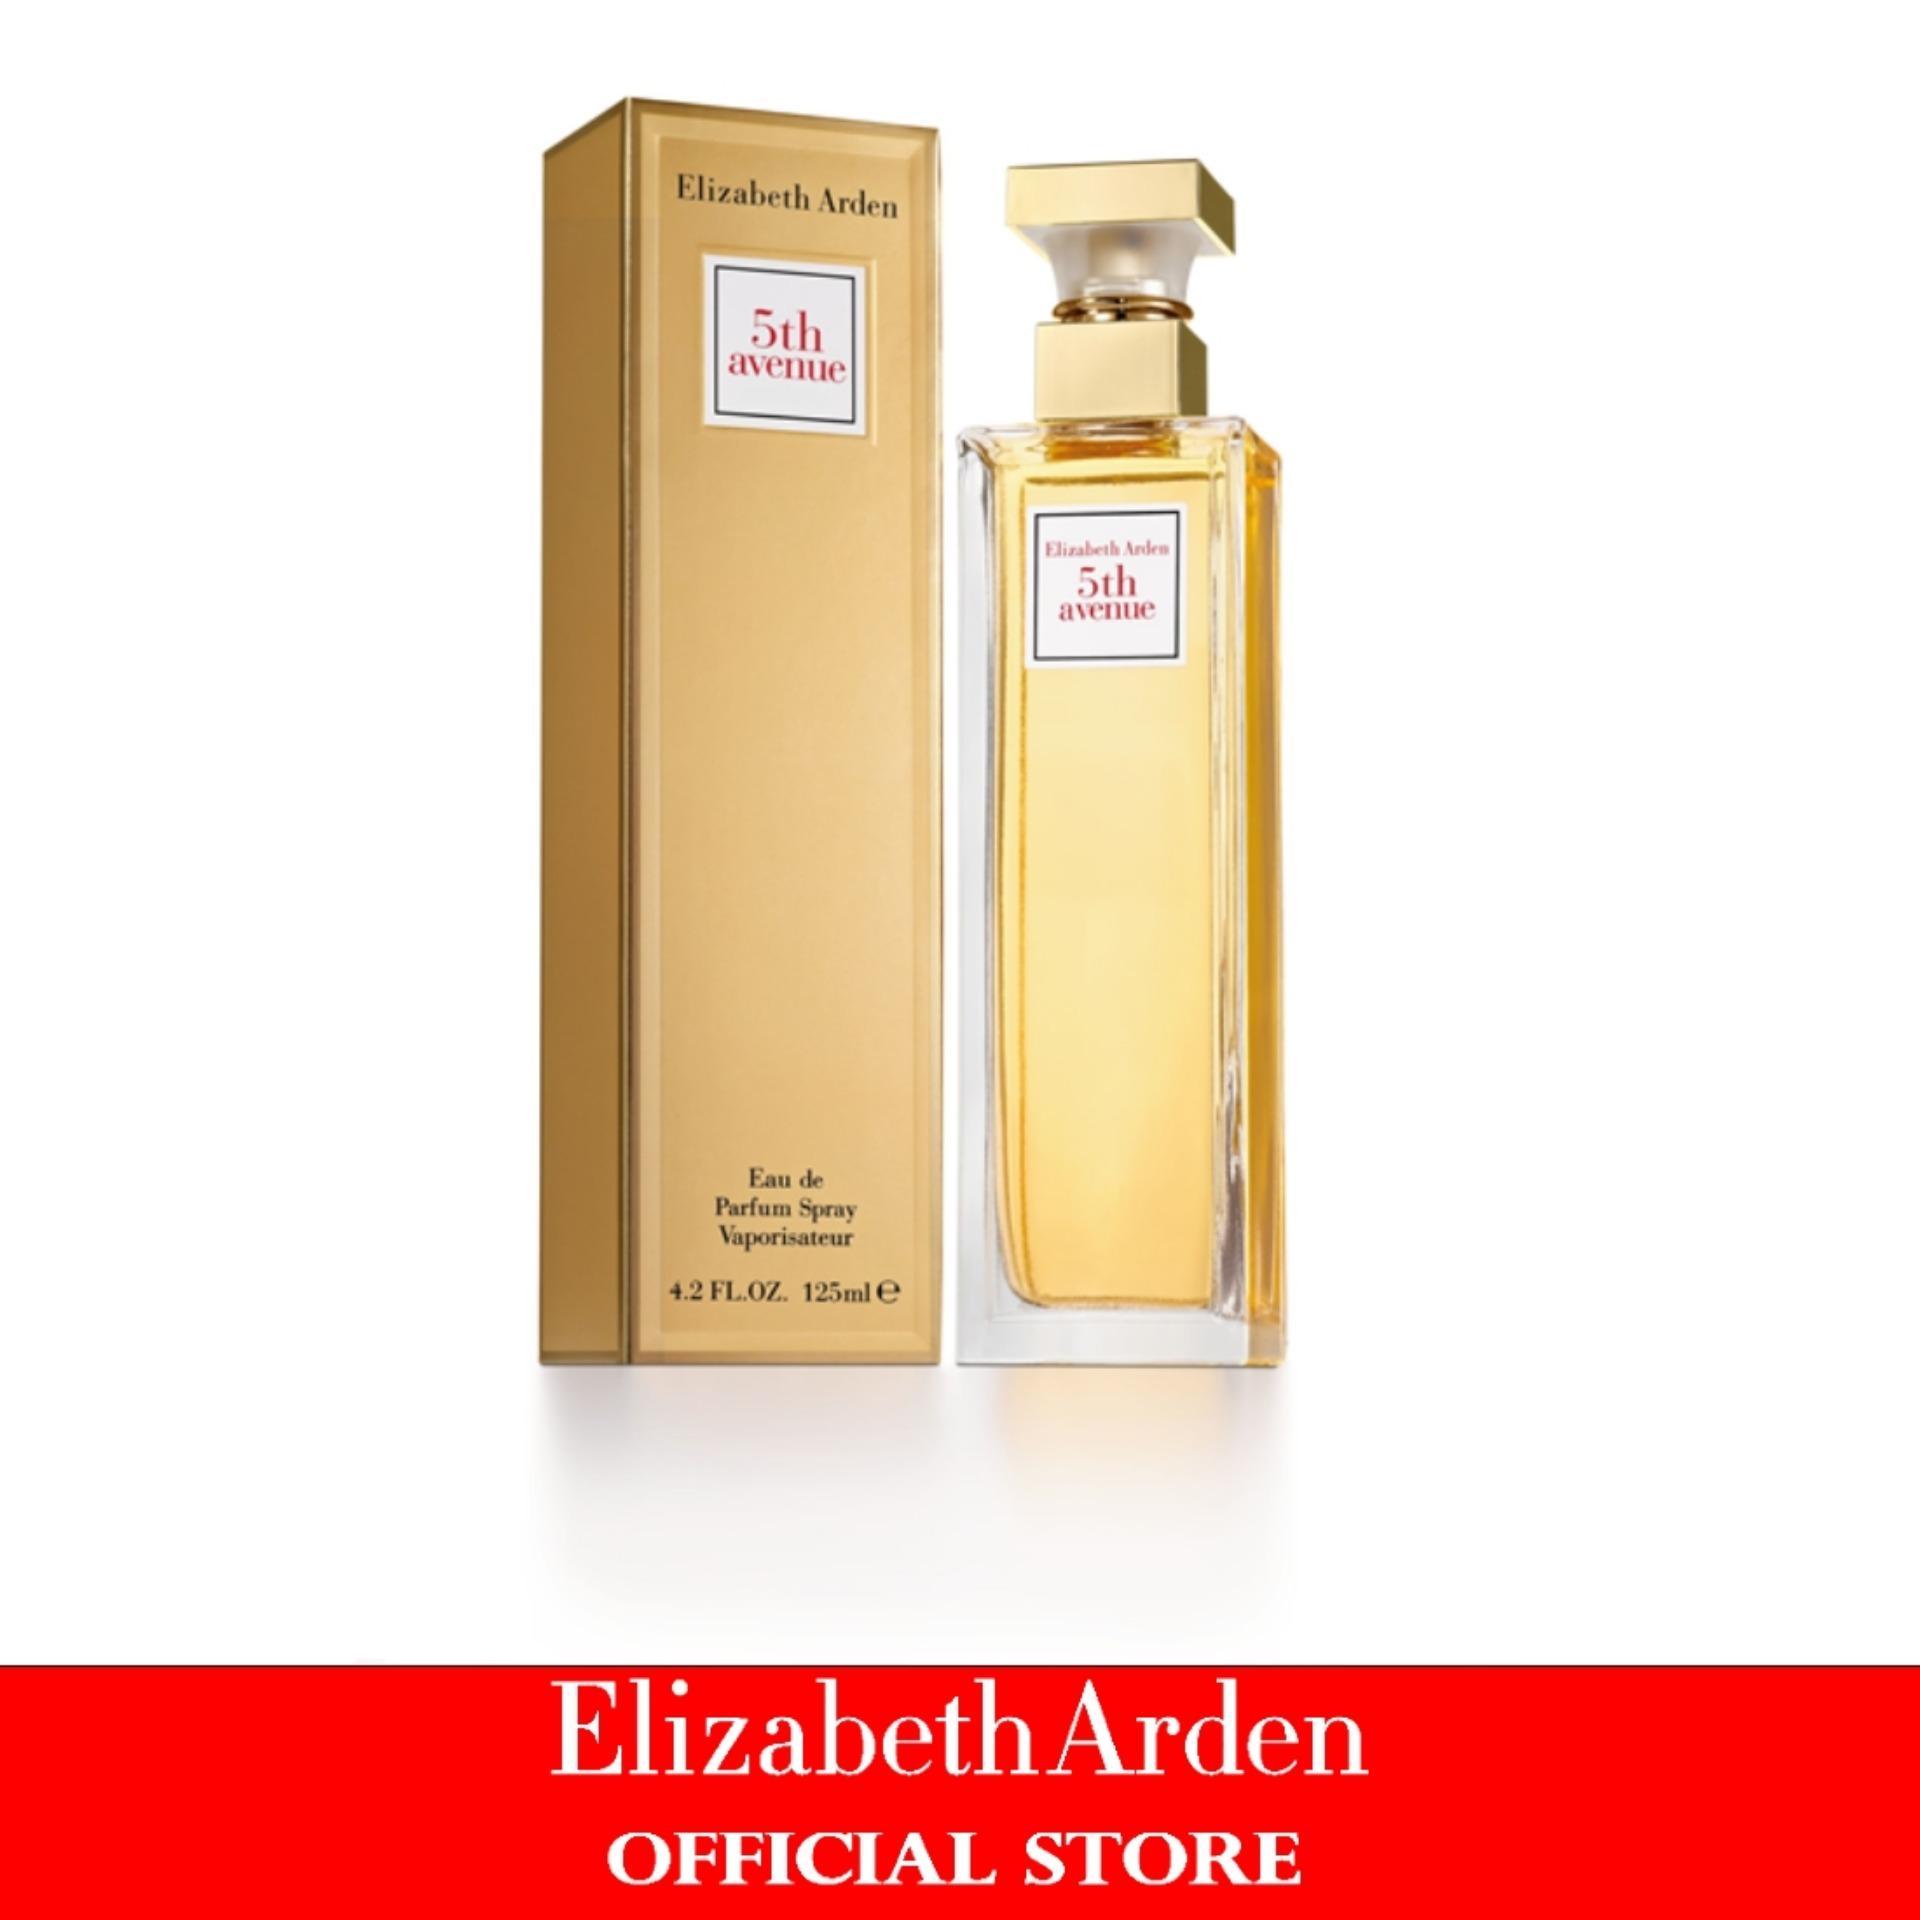 Elizabeth Arden Fifth Avenue Eau De Parfum Spray 4 2 Oz Price Comparison